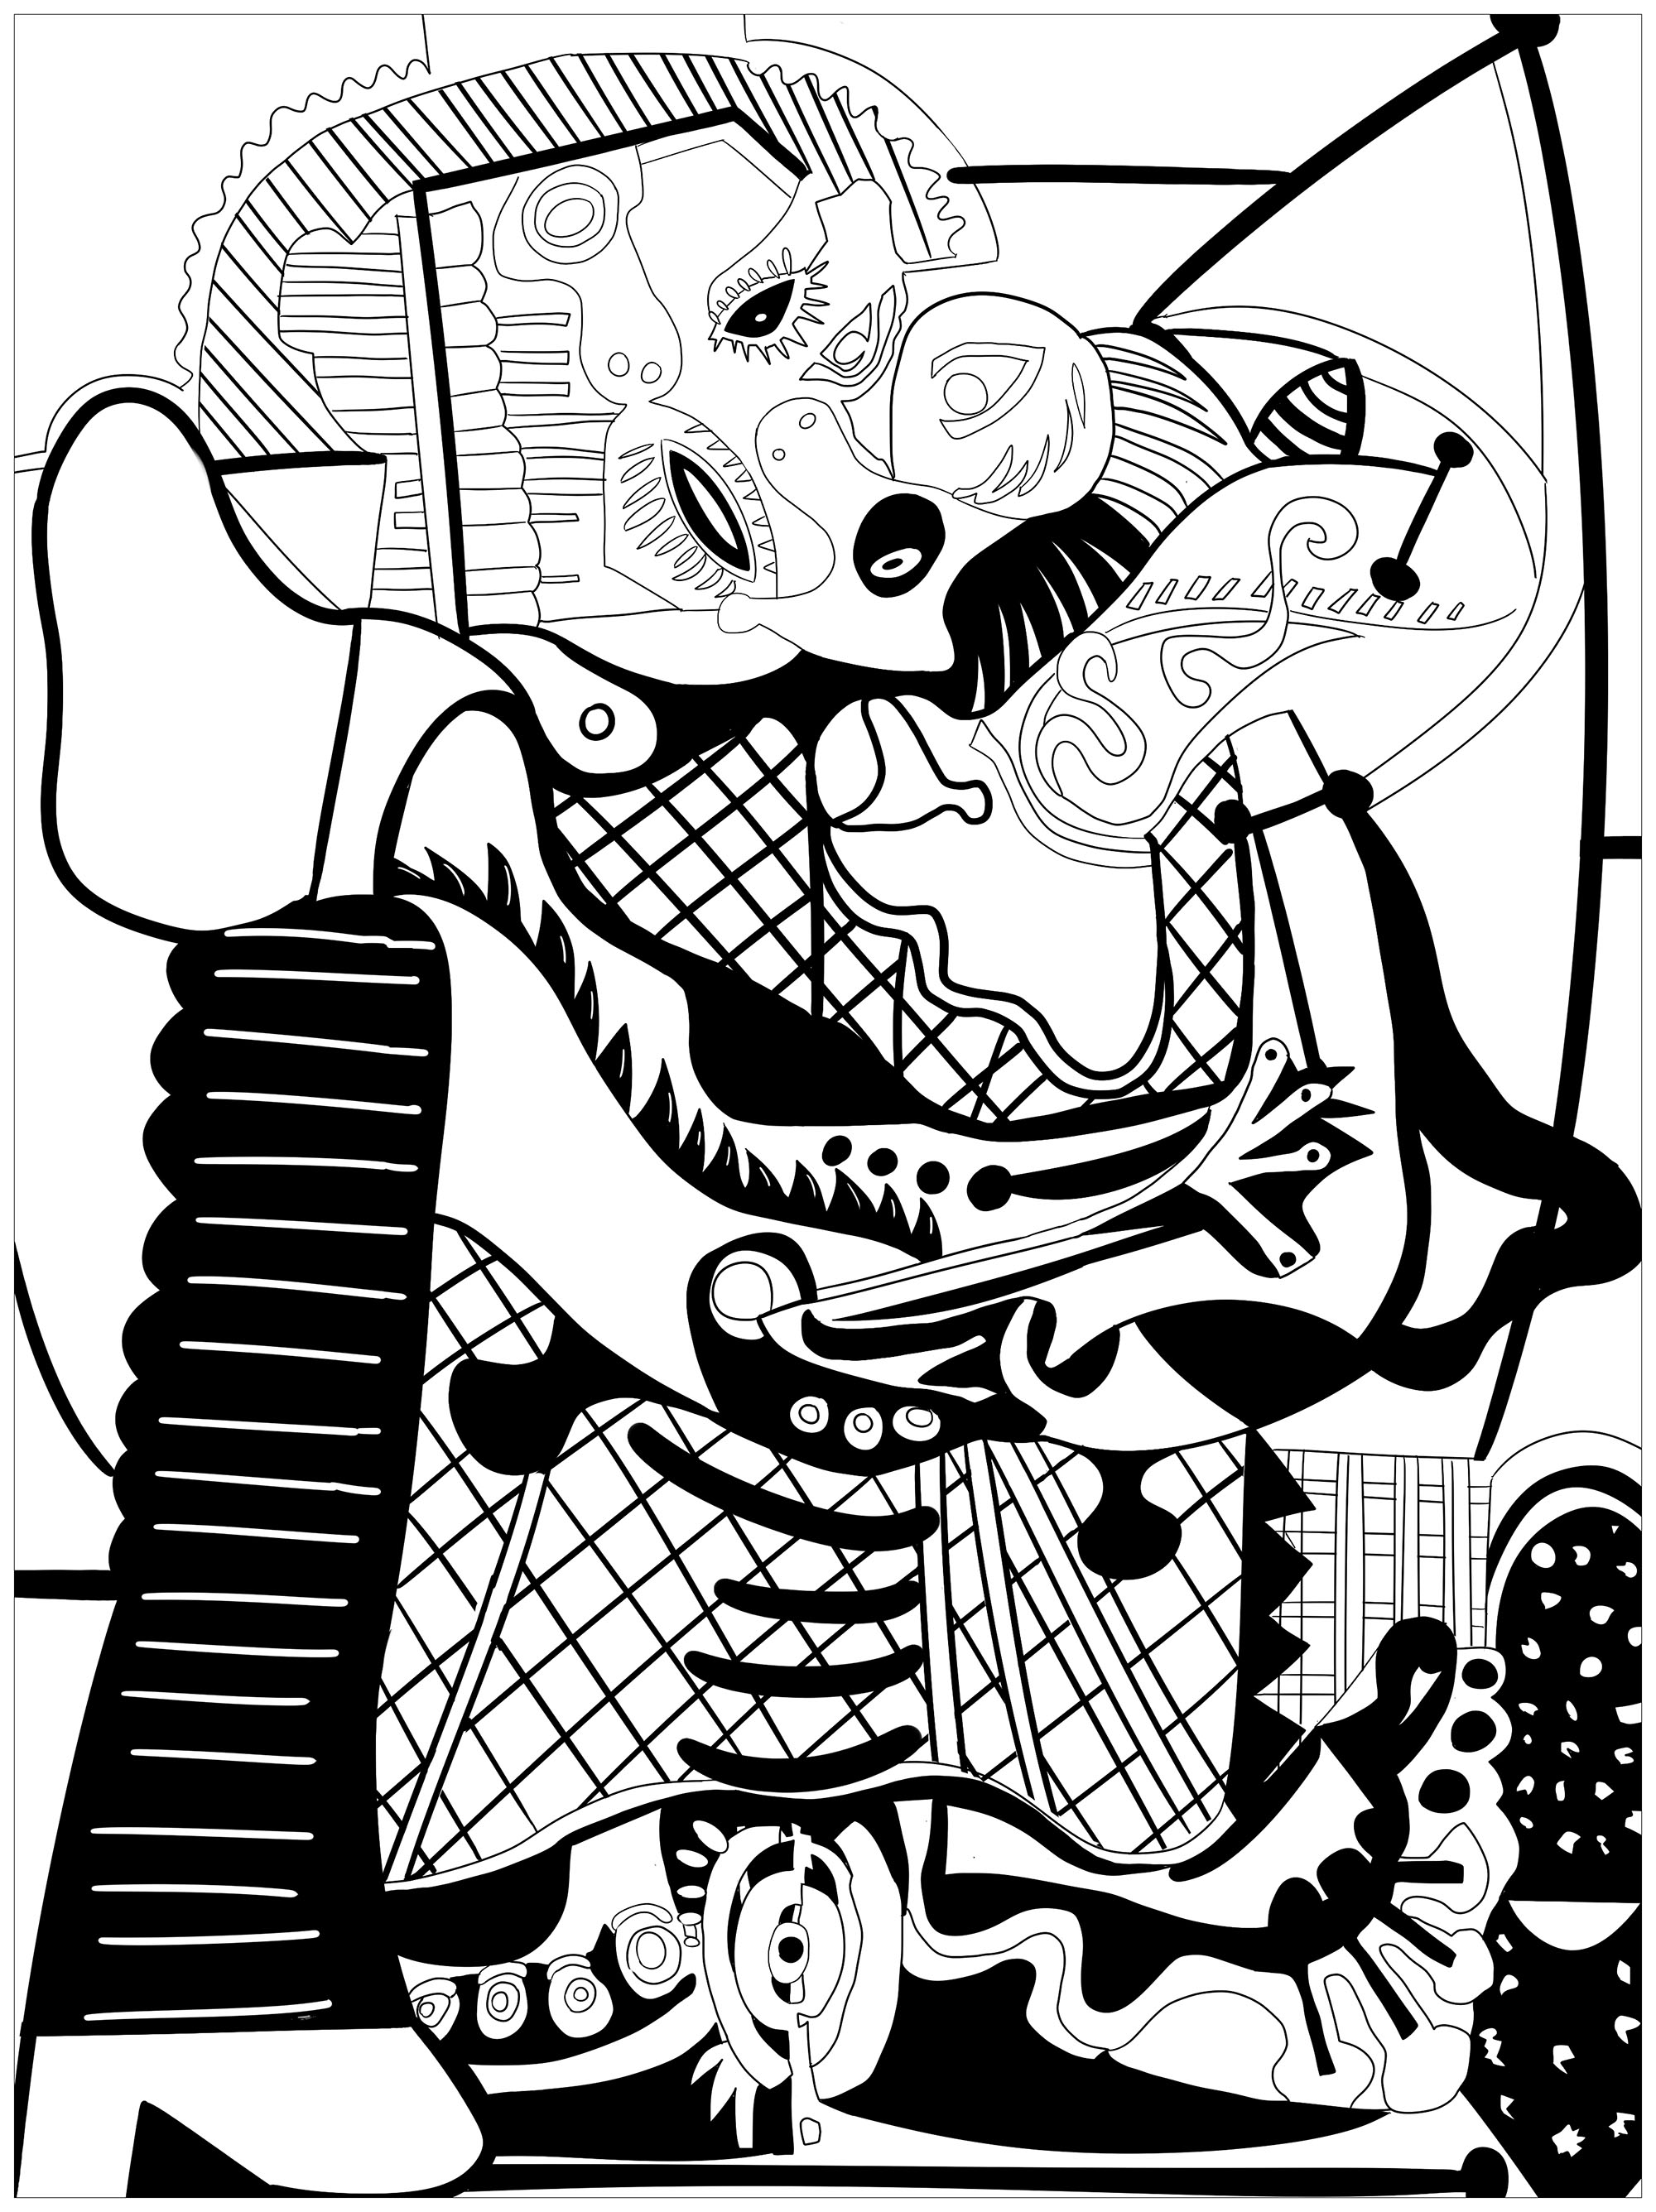 Colorear para adultos  : Obra de arte - 93